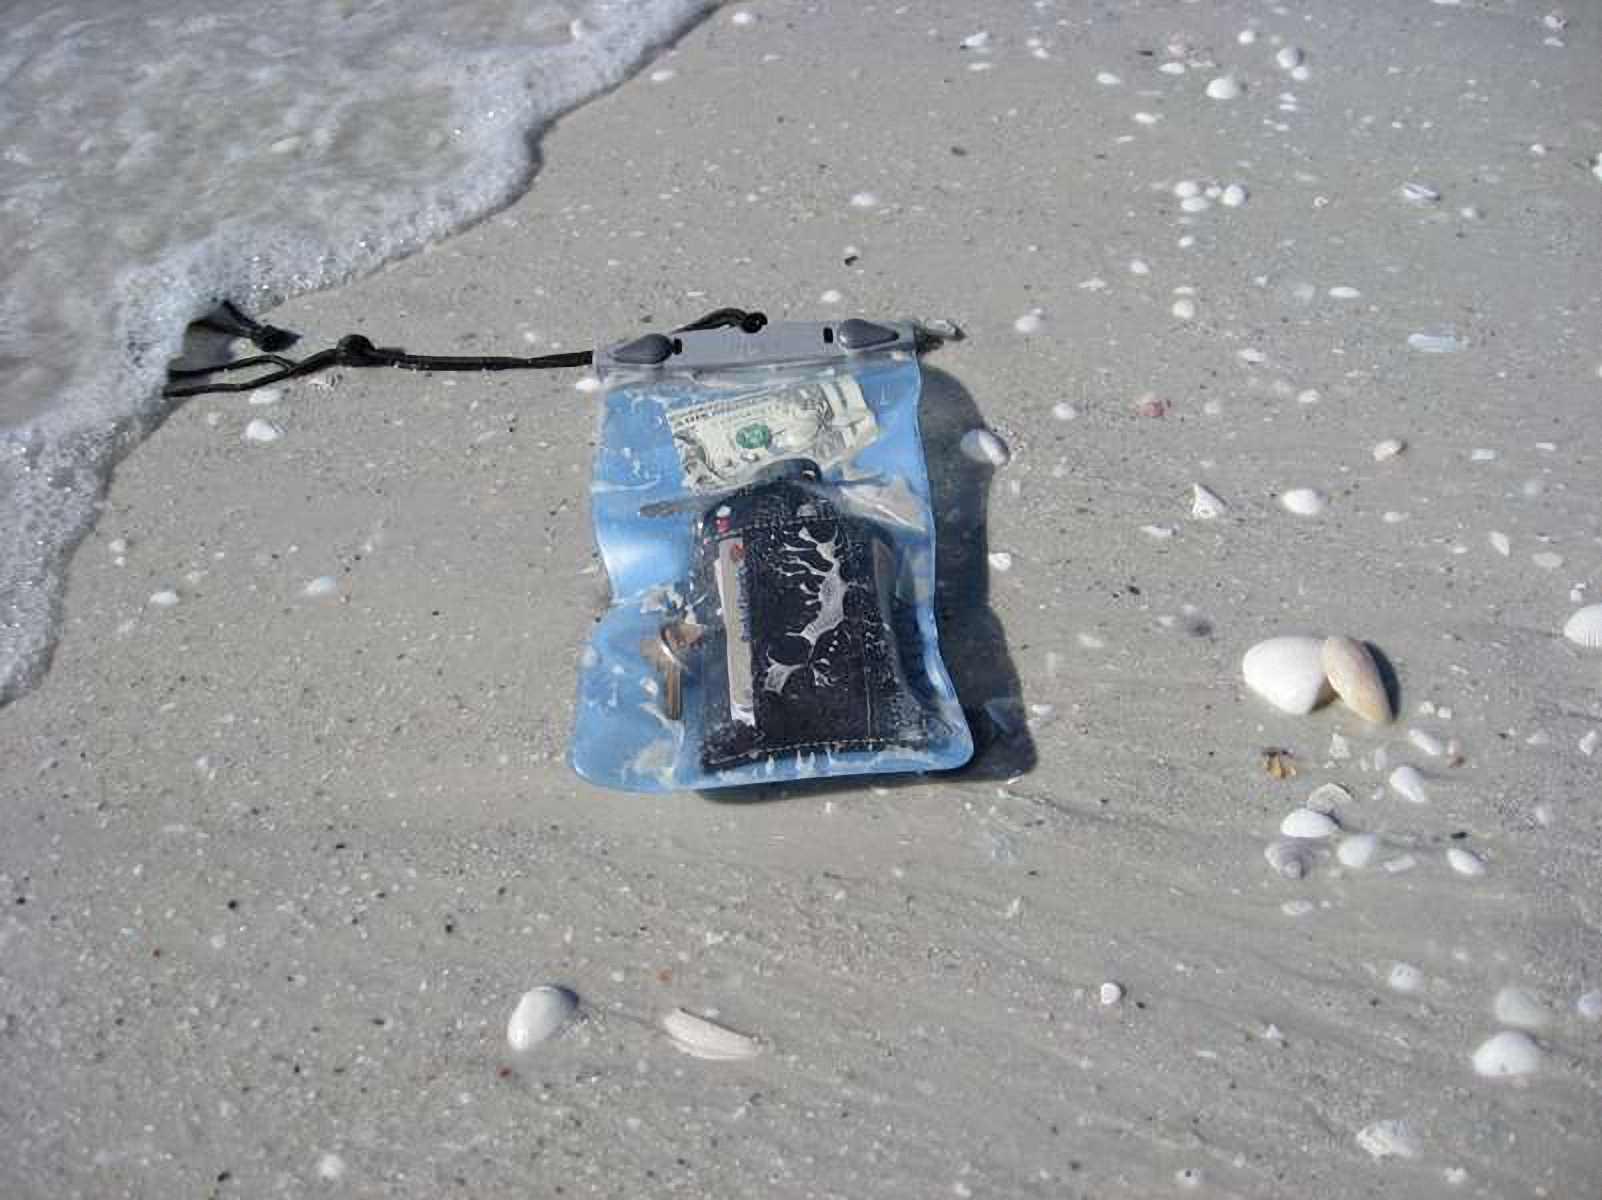 Водонепроницаемый чехол для документов - Aquapac 654. Aquapac - №1 в мире водонепроницаемых чехлов и сумок. Фото 3